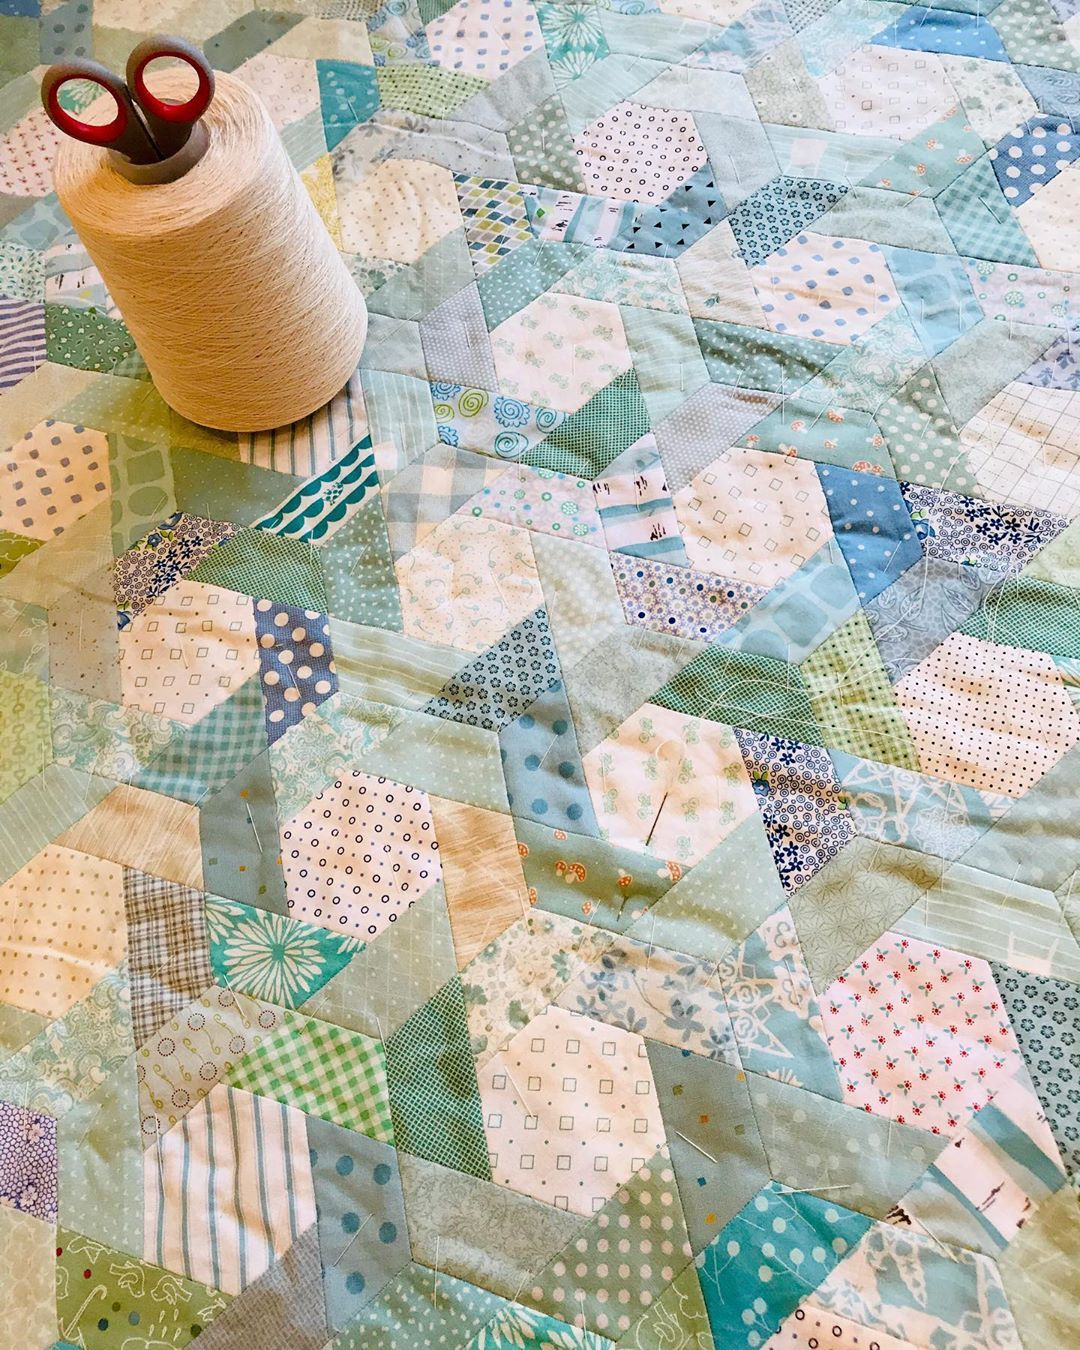 "Inger Marie Loeshagen on Instagram: ""Tid for tråkling i dag.  #epp #quilt #quilting #fabrics #lappeteknikk #patchwork #scrappyquilt #usewhatyouhave #madebyhand #madebyme…"""